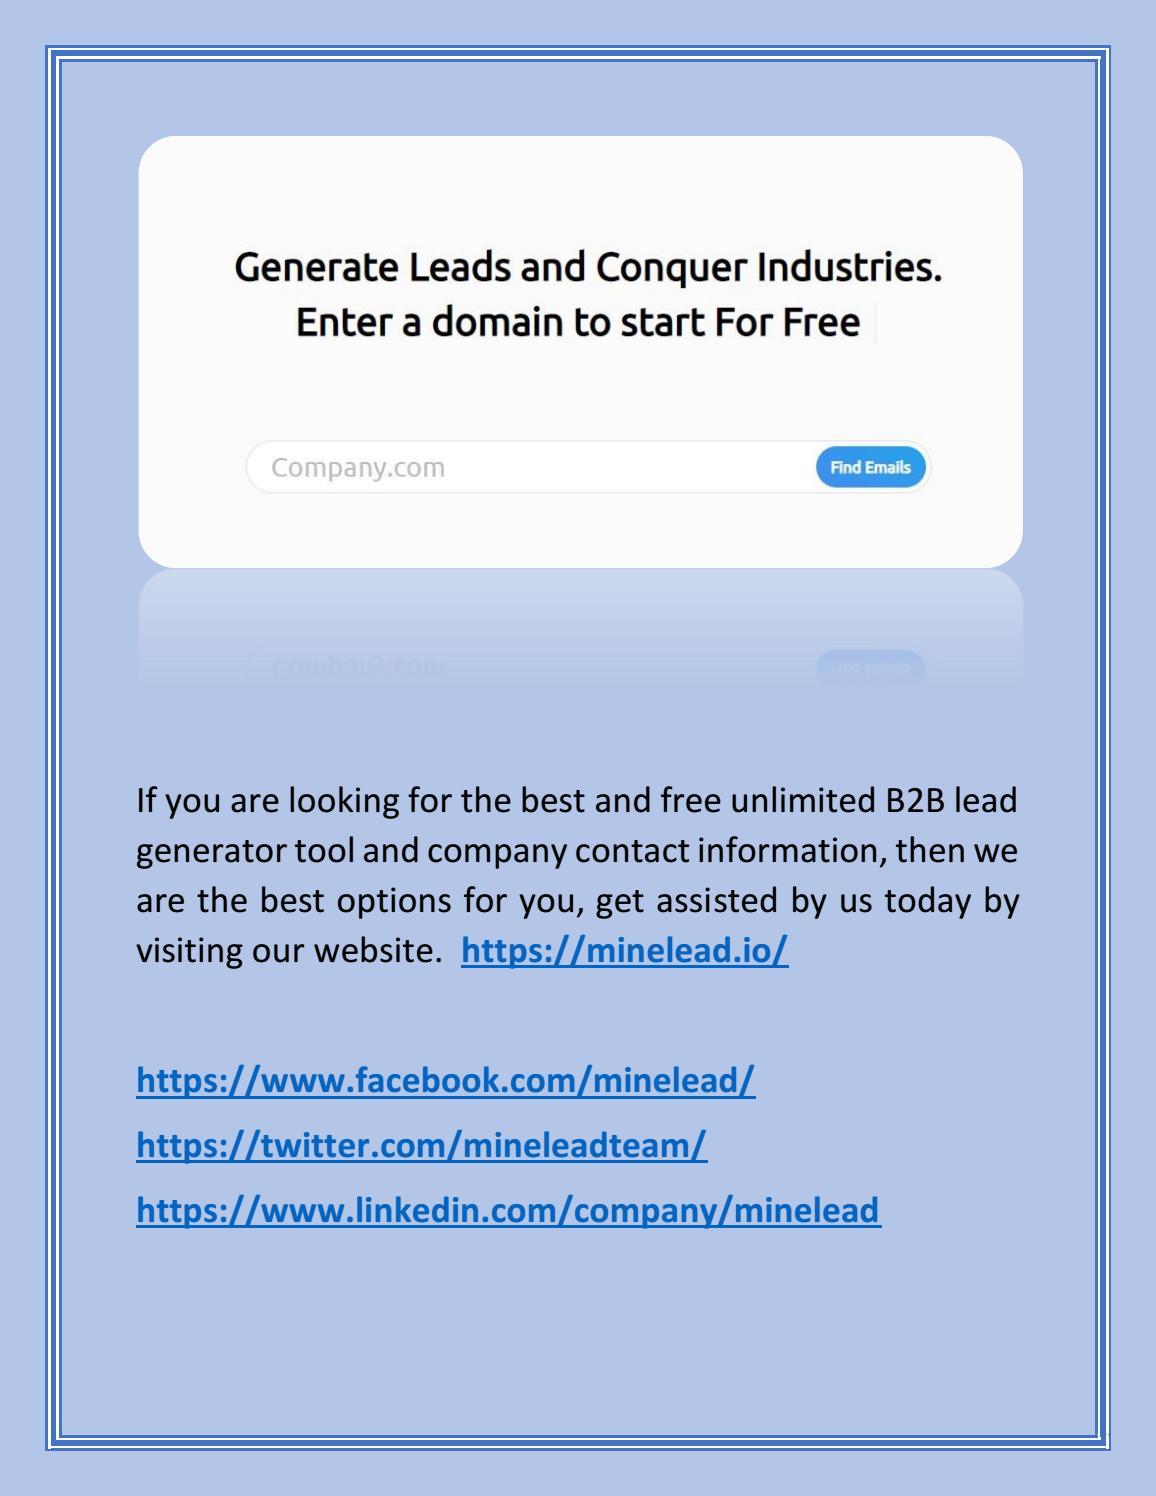 Email Lead Generation Extension   Minelead.io by mineleadltd   issuu